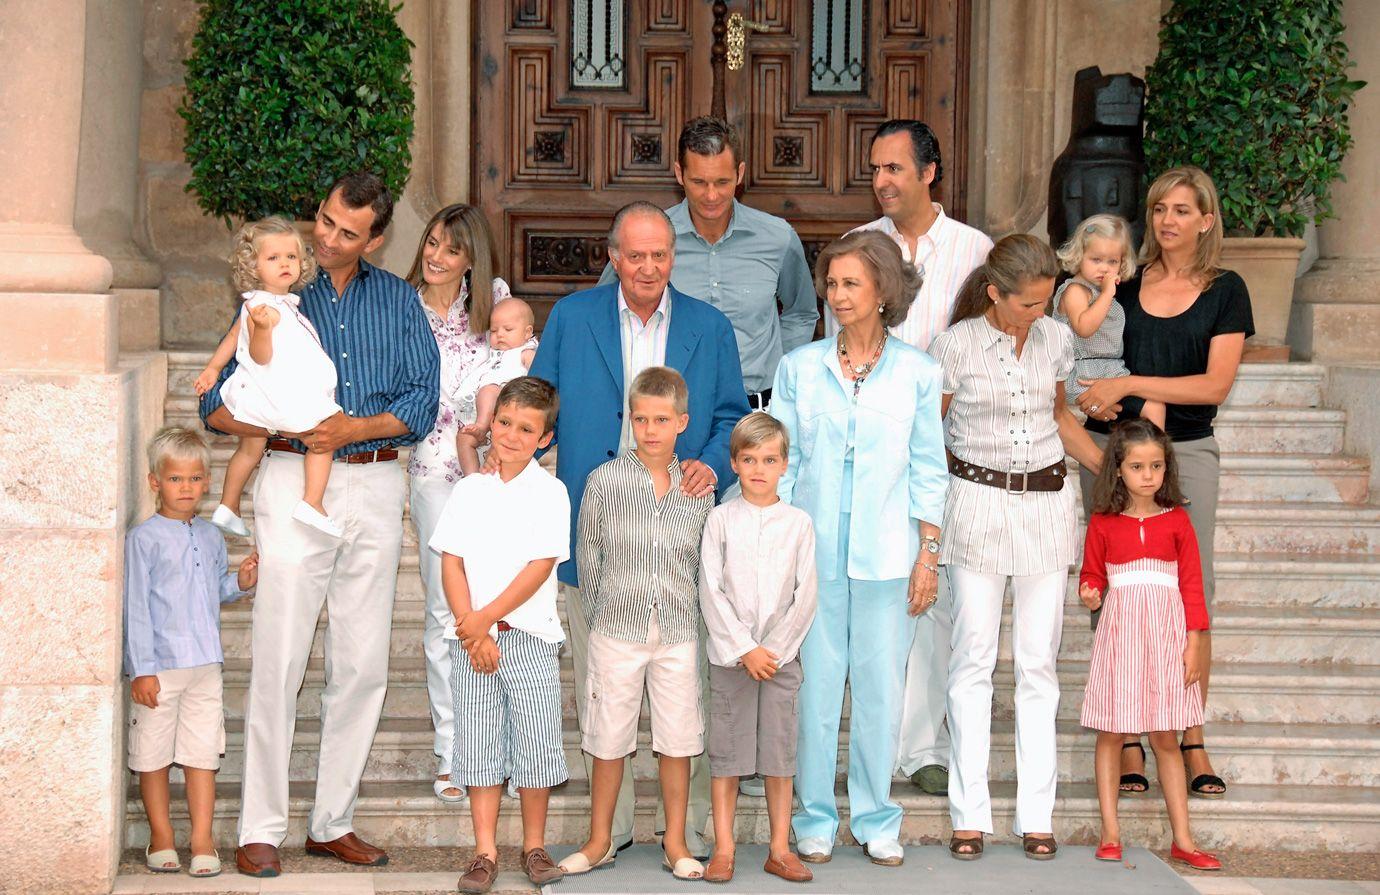 Spanish Royal Family | 04-spanish-royal-family-scandal-family-portrait-tcx1113.jpg